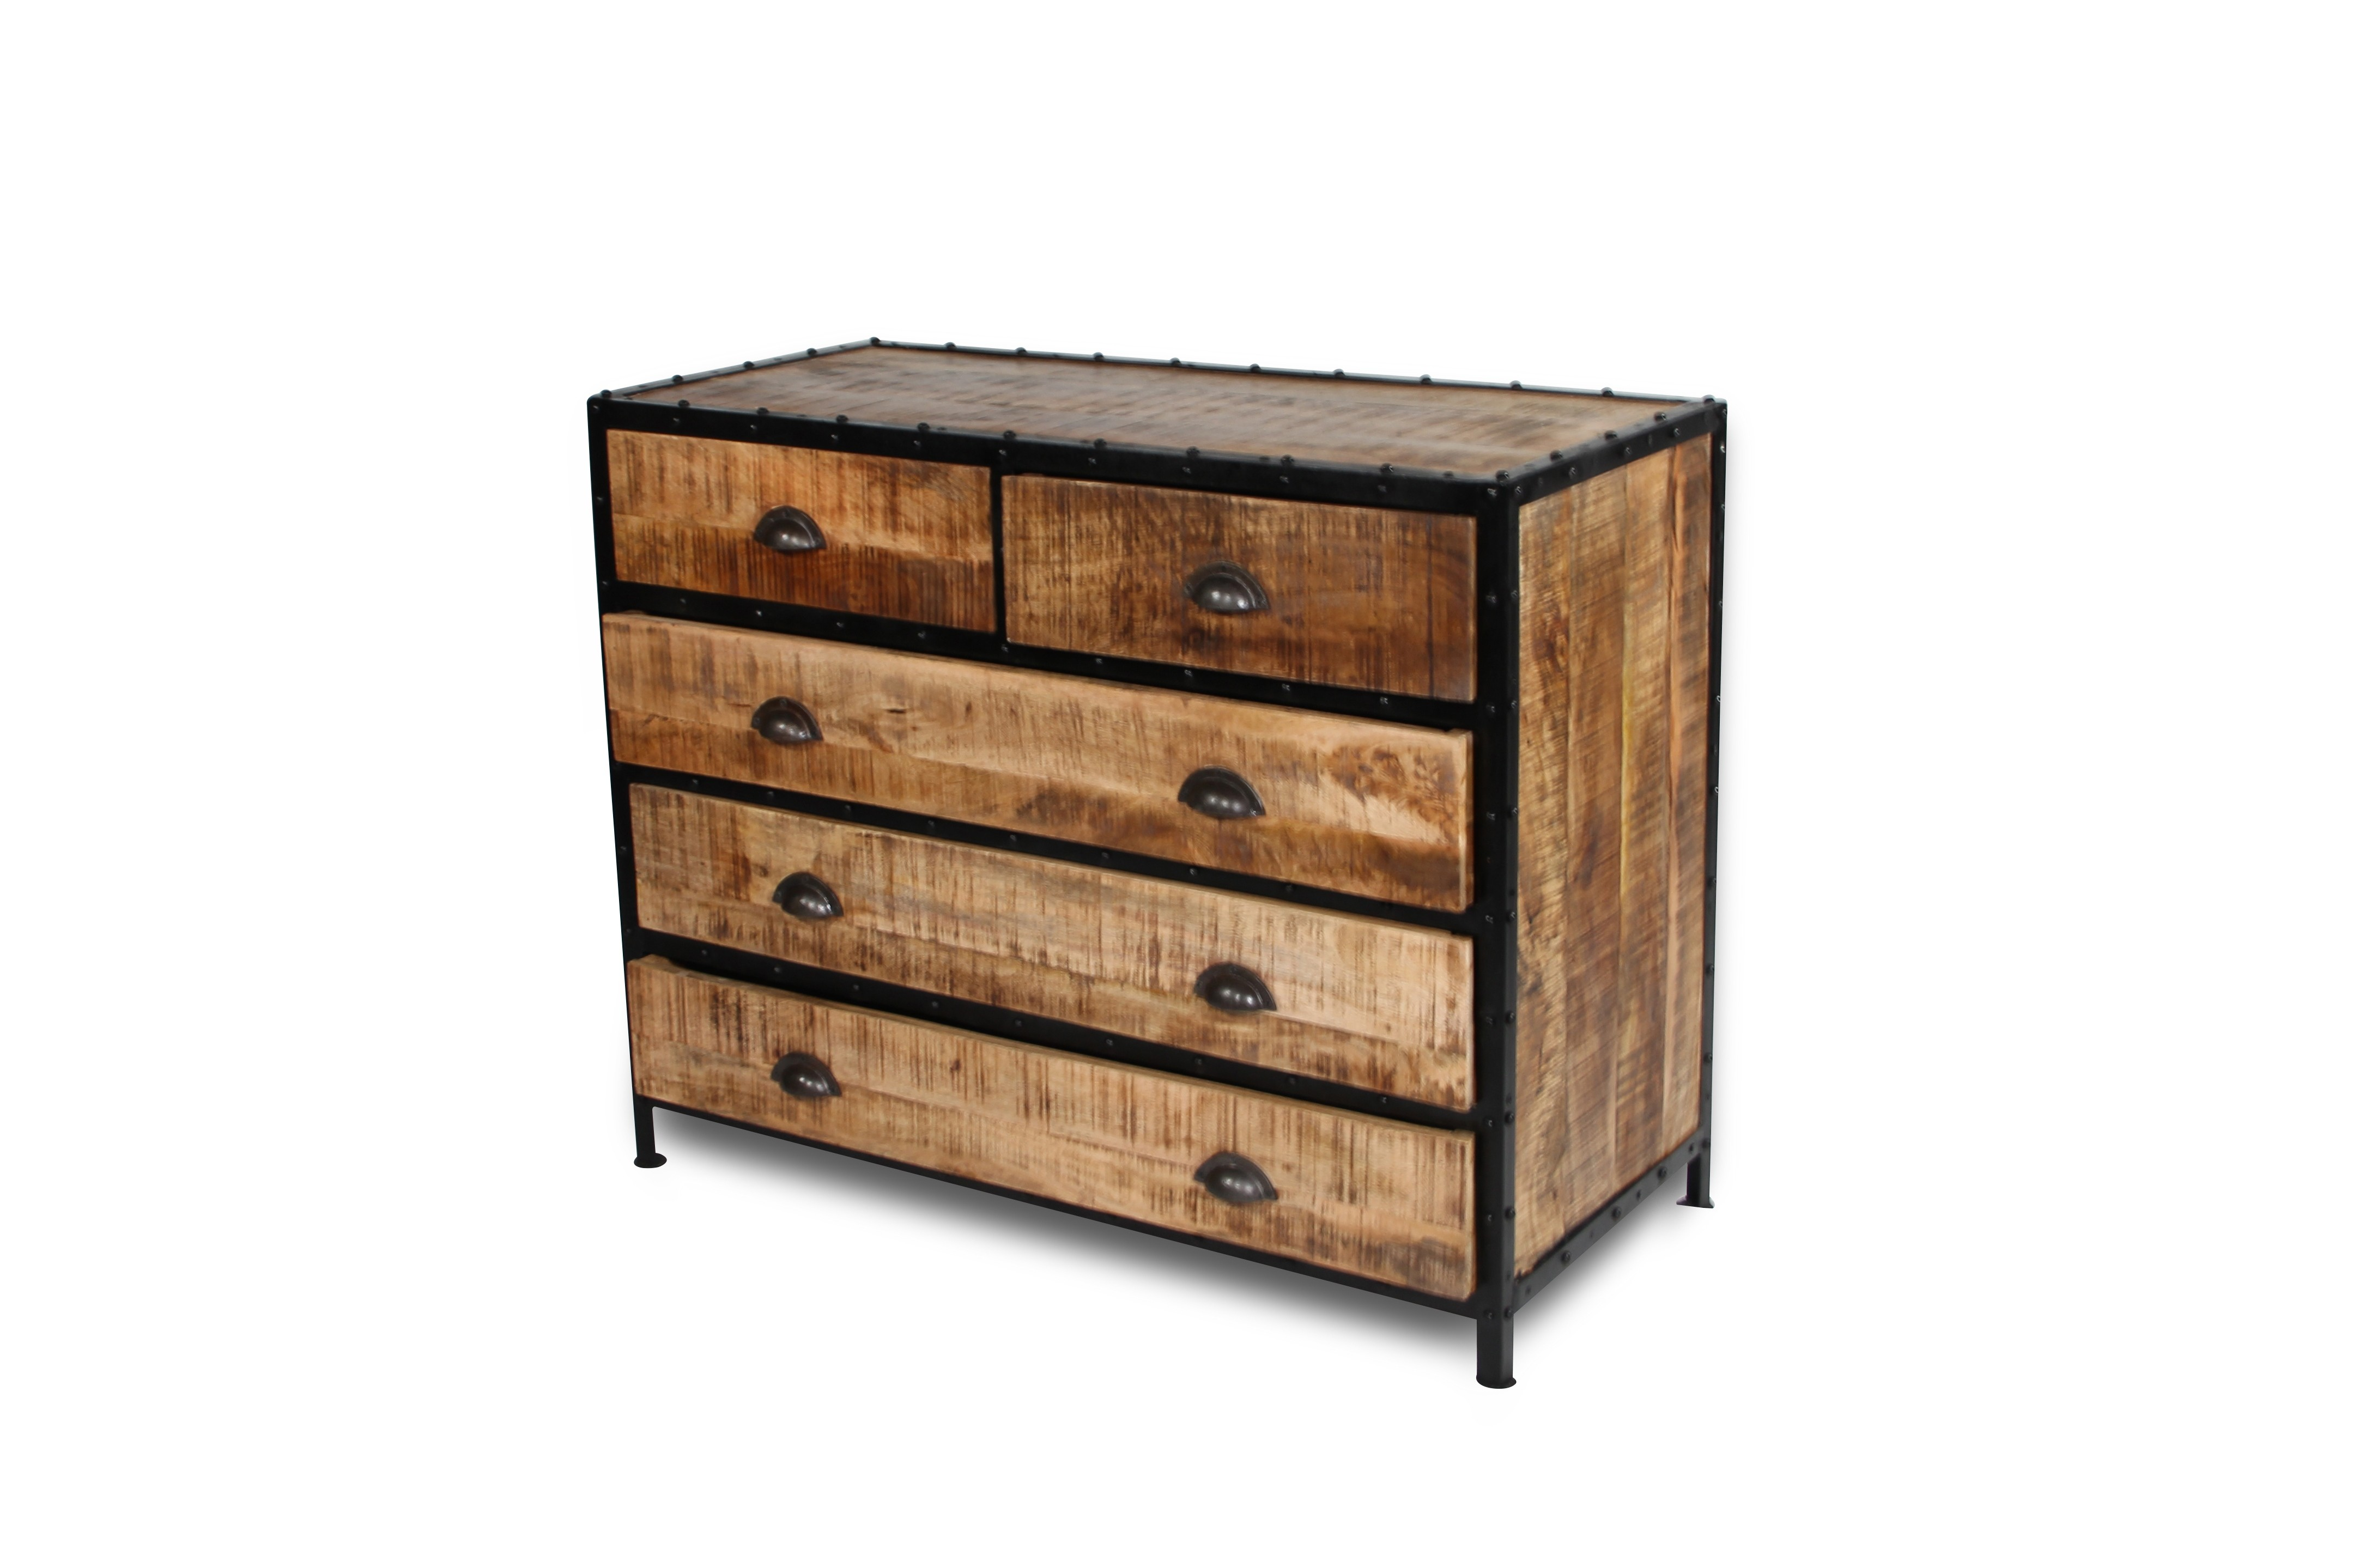 commode vintage en bois patin et m tal style loft. Black Bedroom Furniture Sets. Home Design Ideas